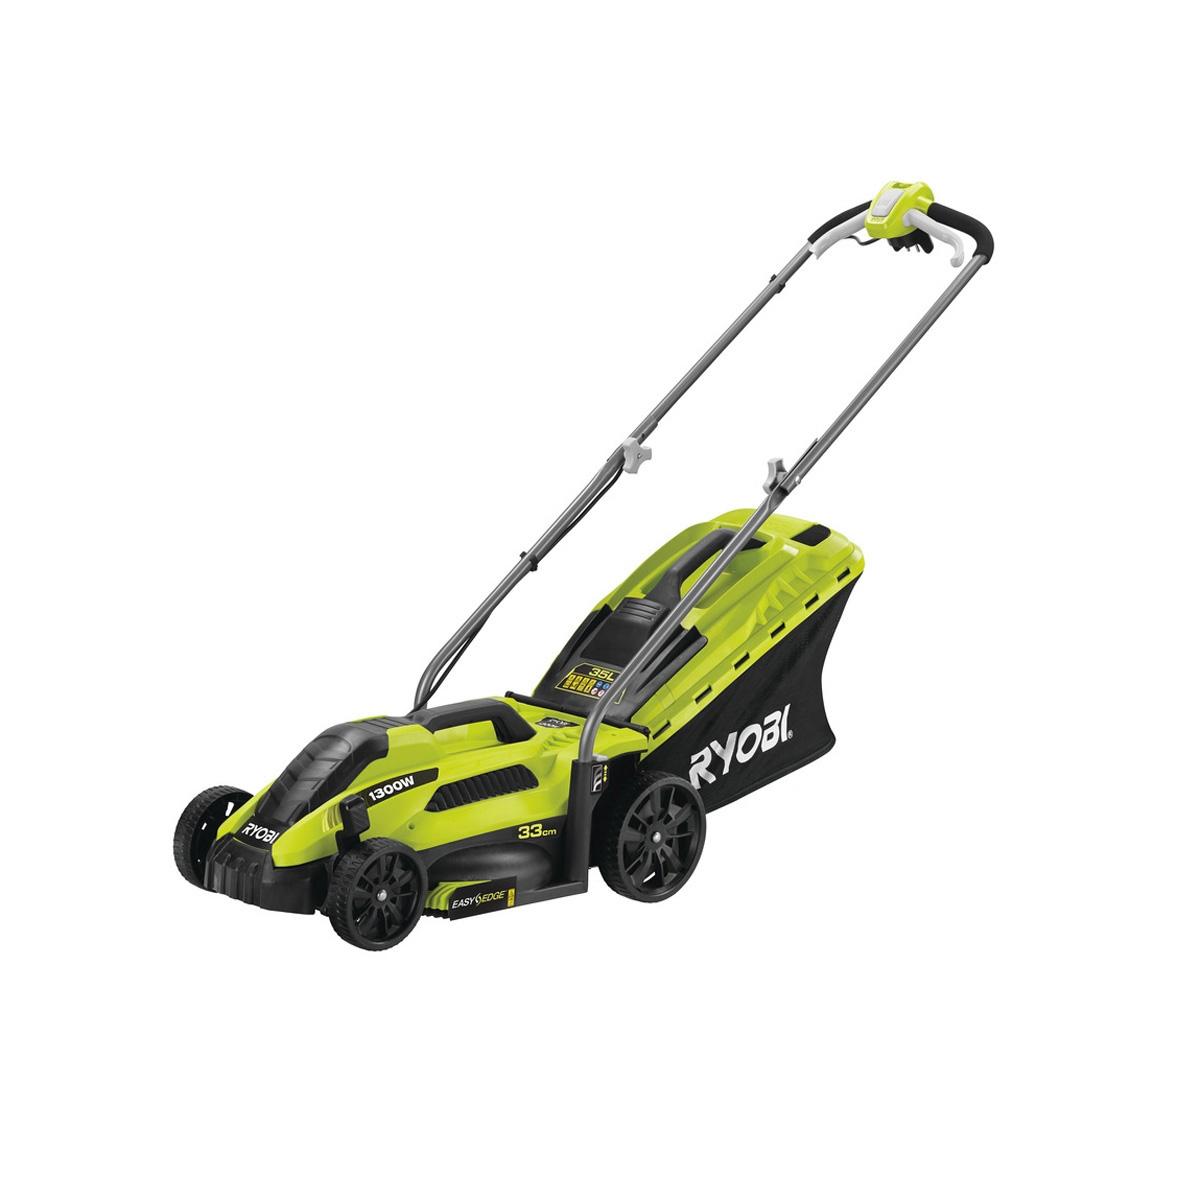 Ryobi electric lawn mower RLM13E33S